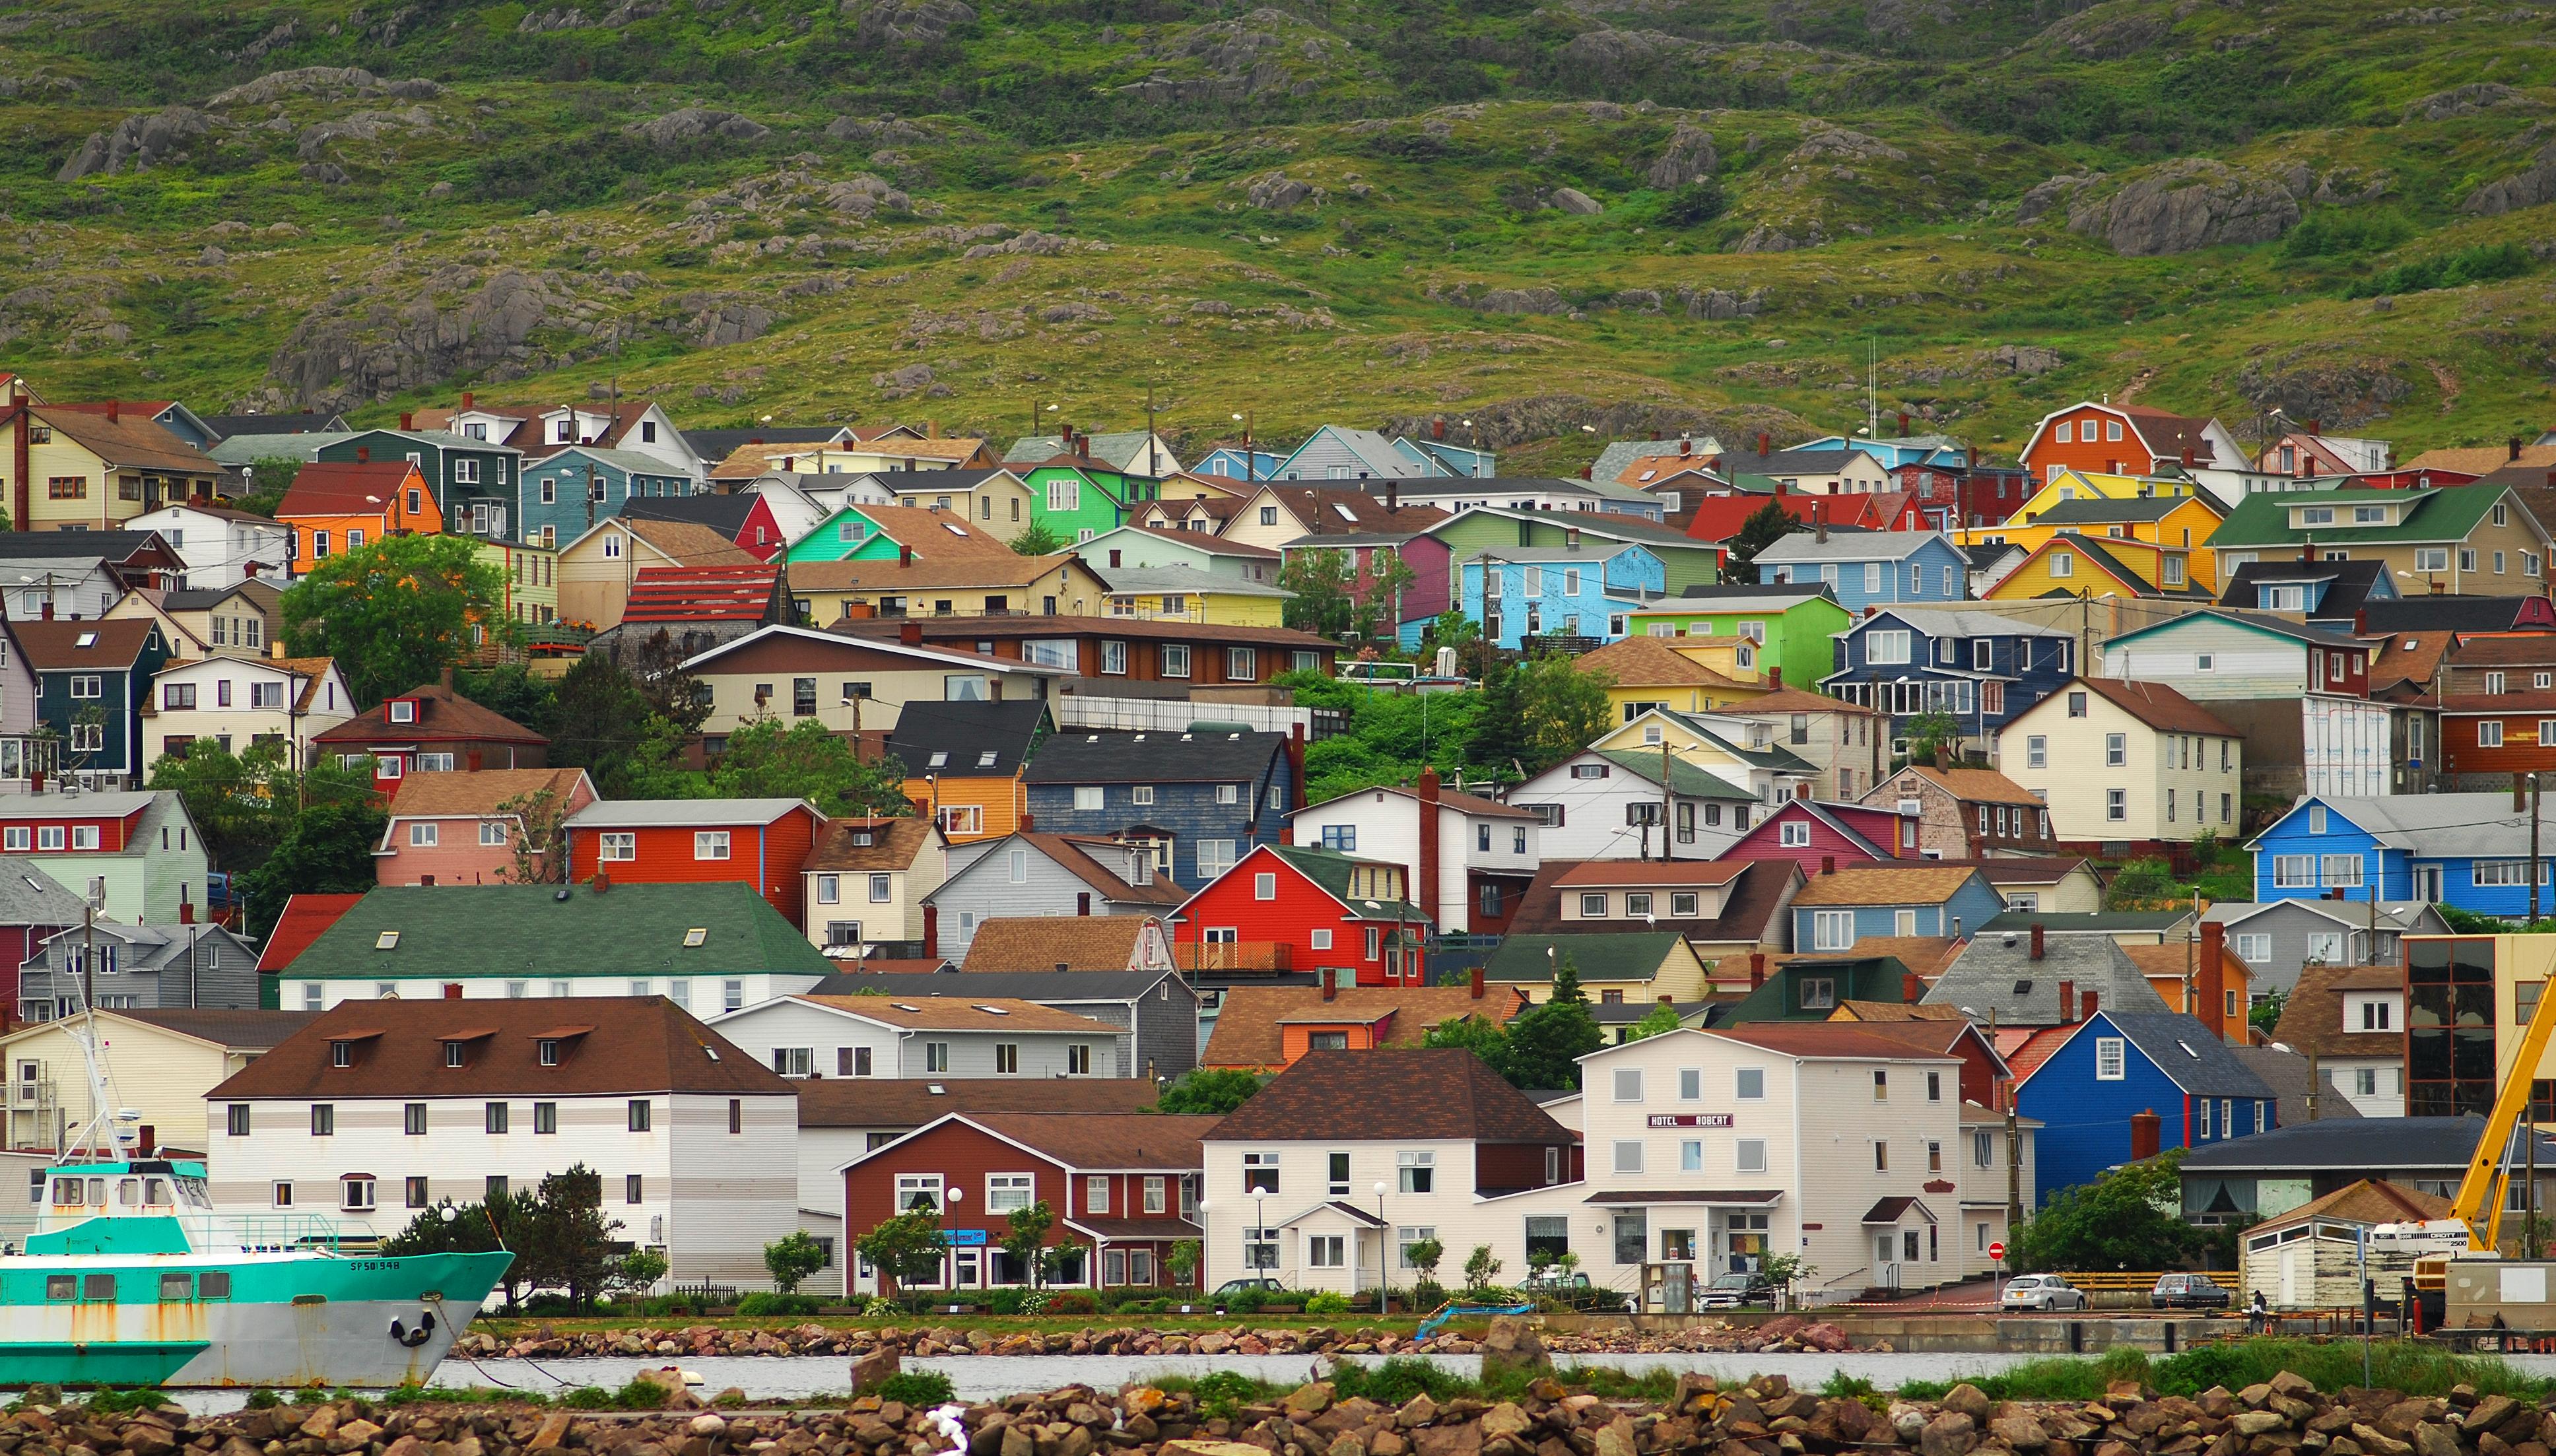 St Pierre et Miquelon 2009 | Flickr - Photo Sharing!